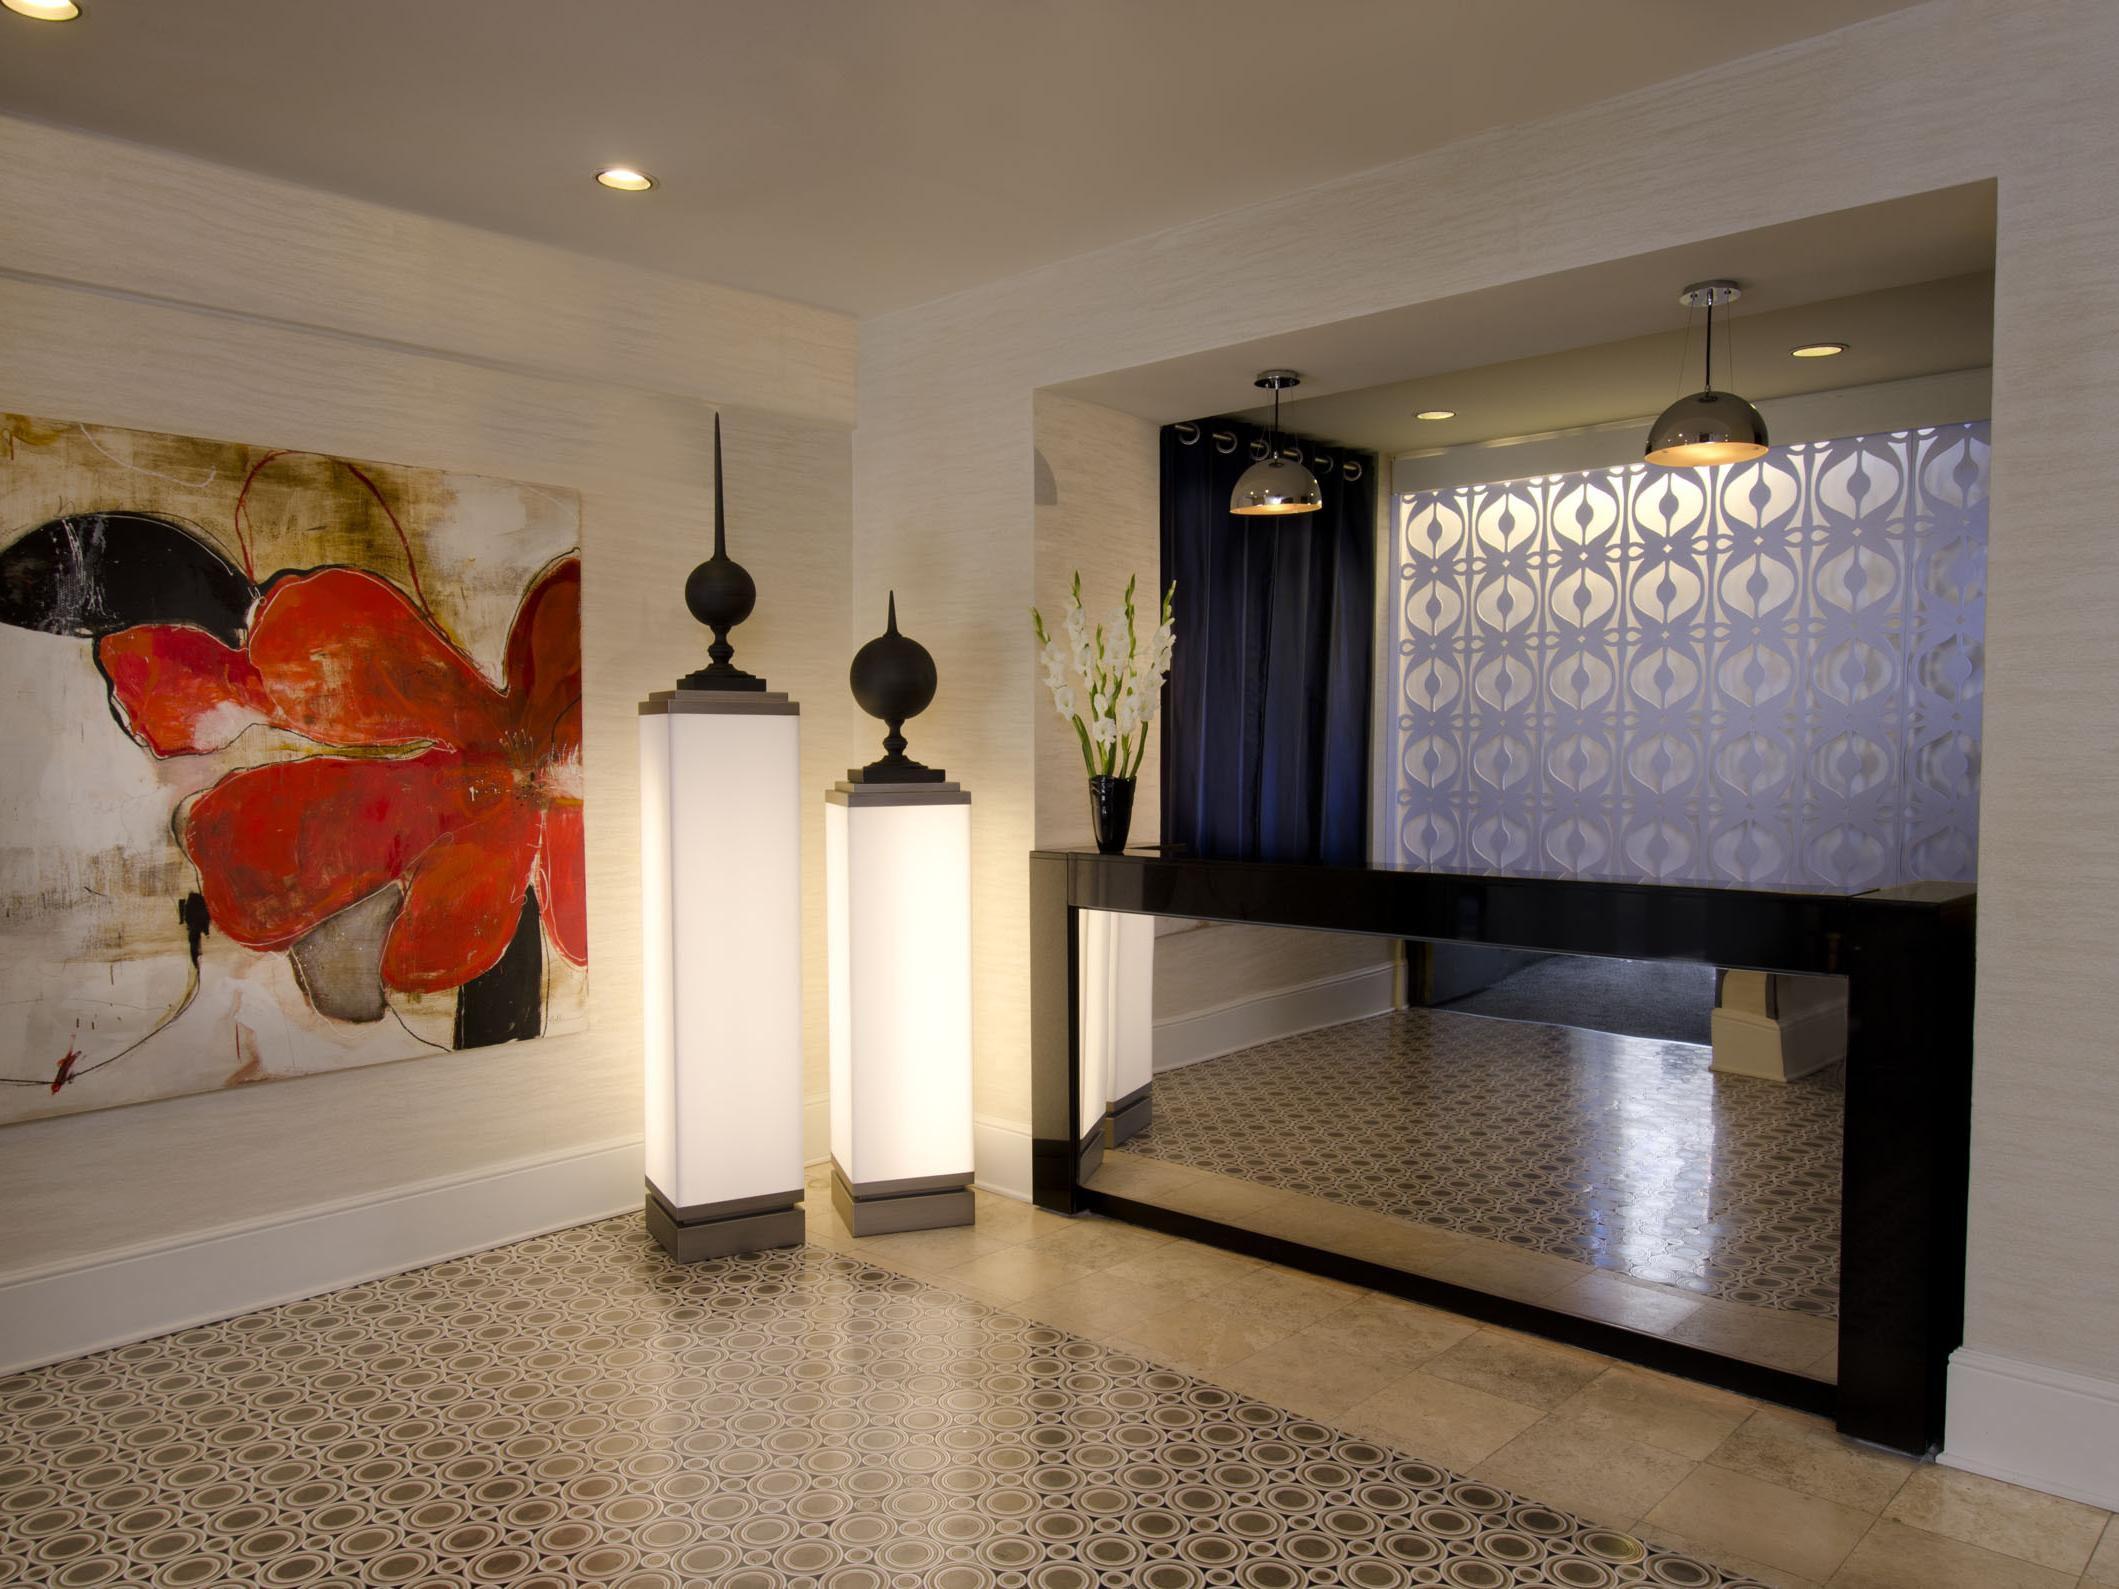 Kimpton topaz hotel in washington dc kimpton hotels for Kimpton hotels